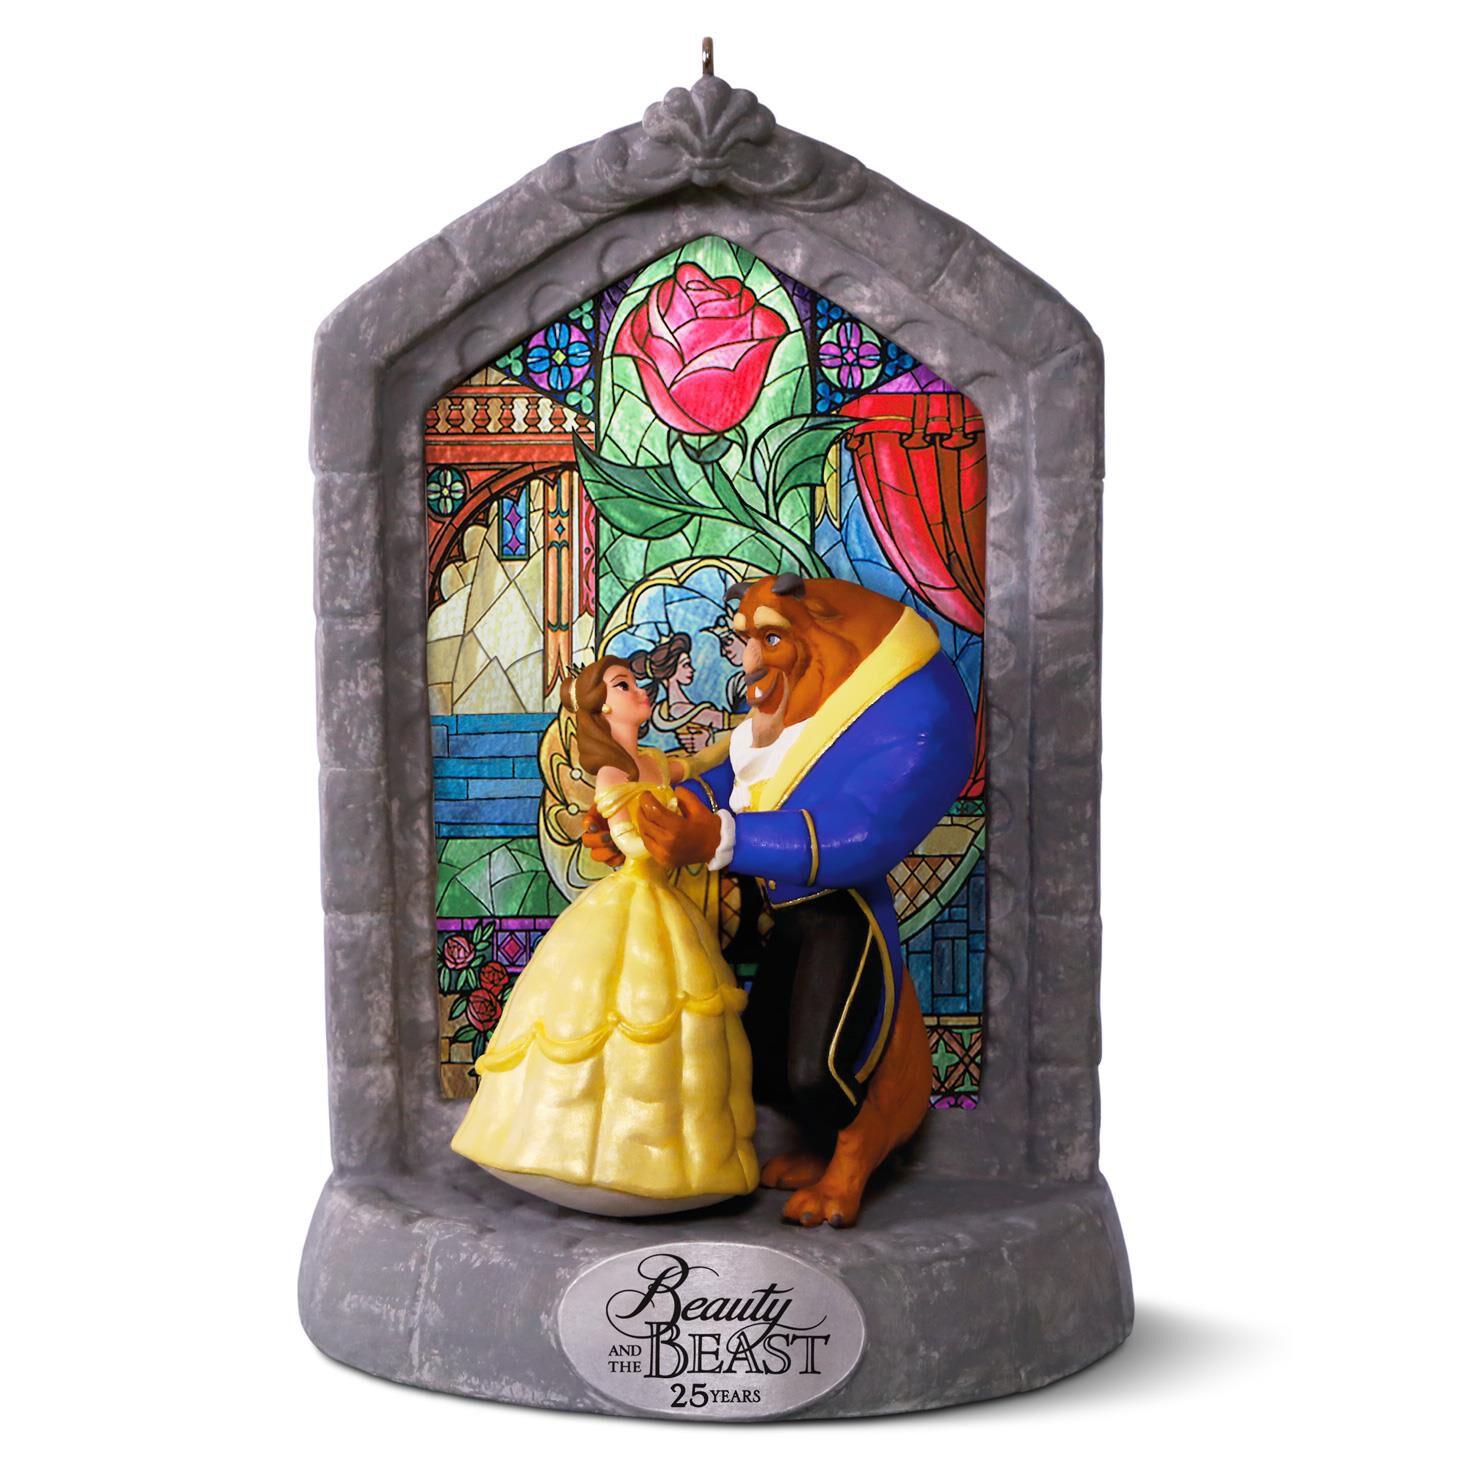 25th wedding anniversary christmas ornament - Disney Beauty And The Beast 25th Anniversary Musical Ornament Keepsake Ornaments Hallmark